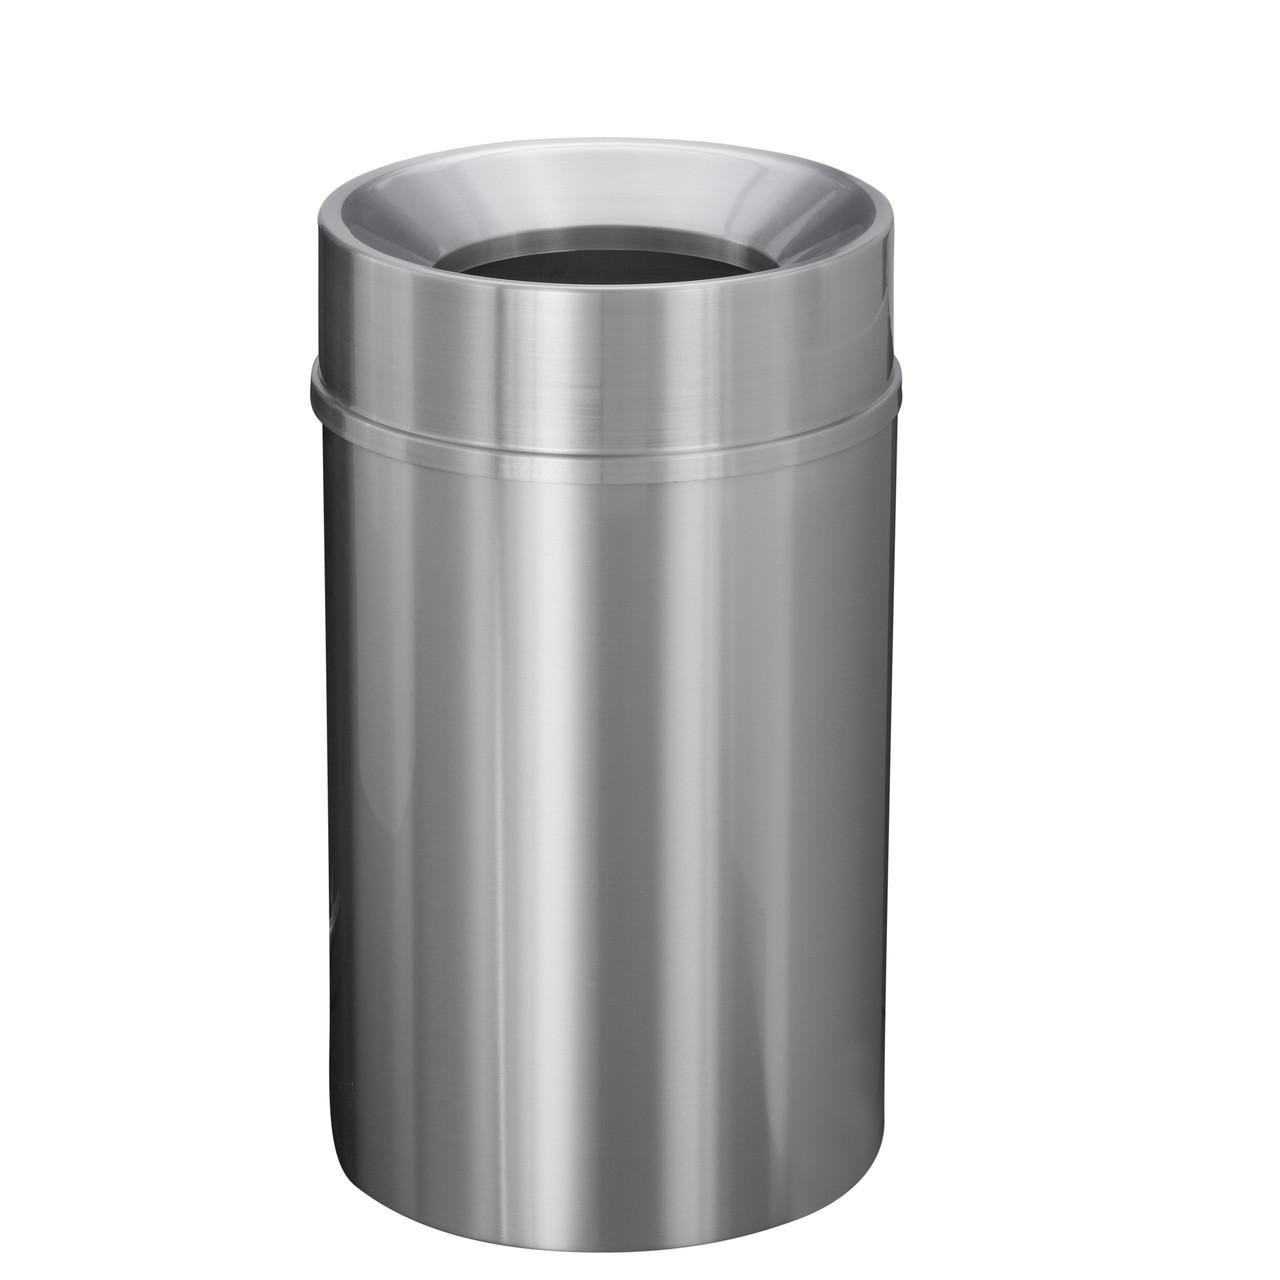 New Yorker 33 Gallon F2035SA Funnel Top Trash Receptacle w/Plastic Liner